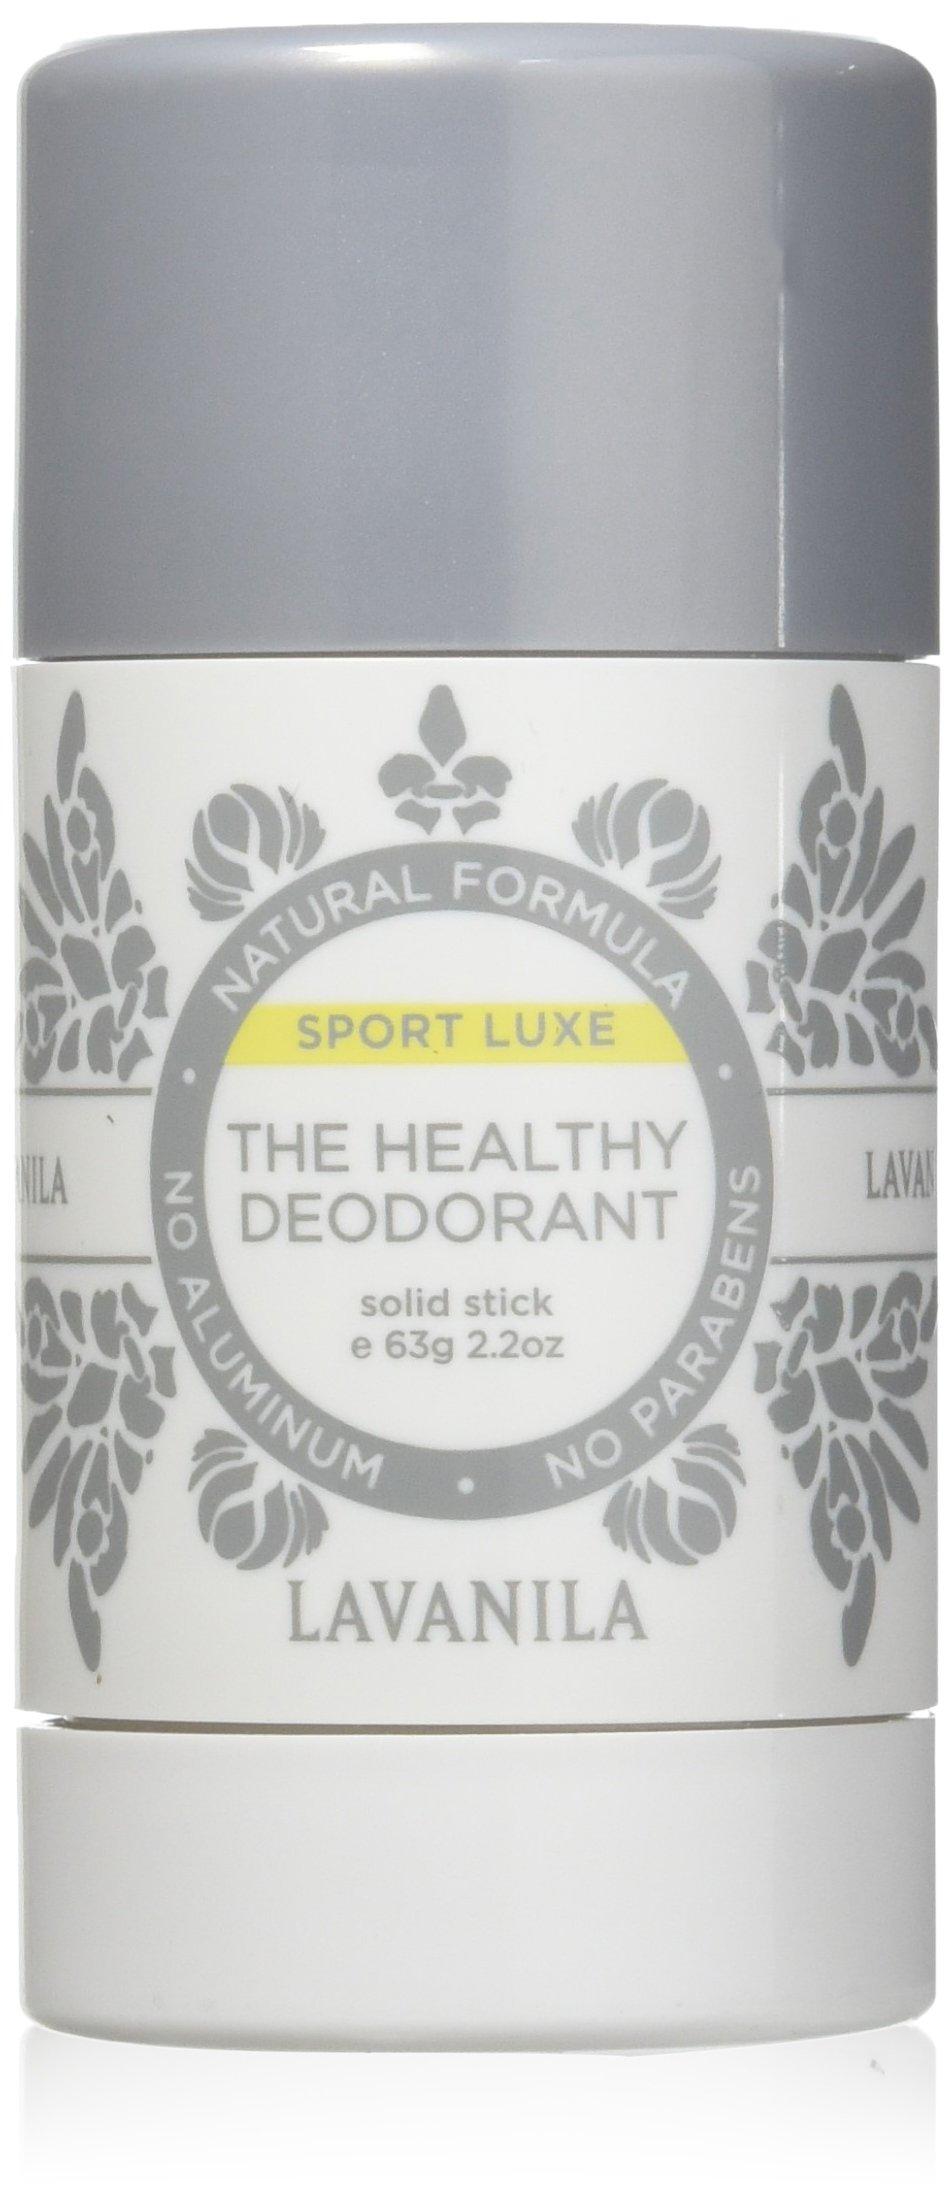 LaVanila - Sport Luxe Healthy Deodorant - 2.2 Oz/Vanilla Breeze